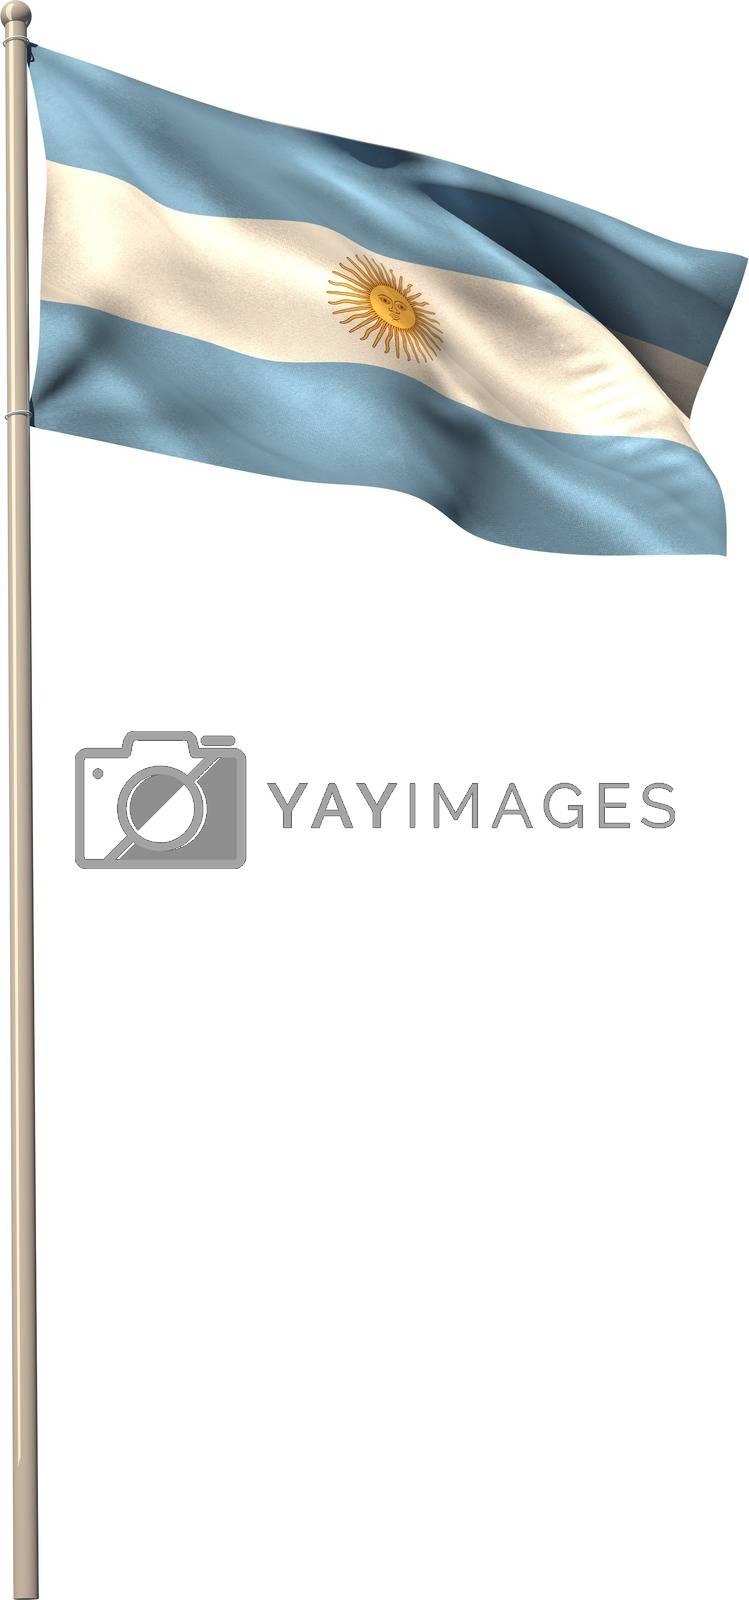 Royalty free image of Digitally generated argentina national flag by Wavebreakmedia